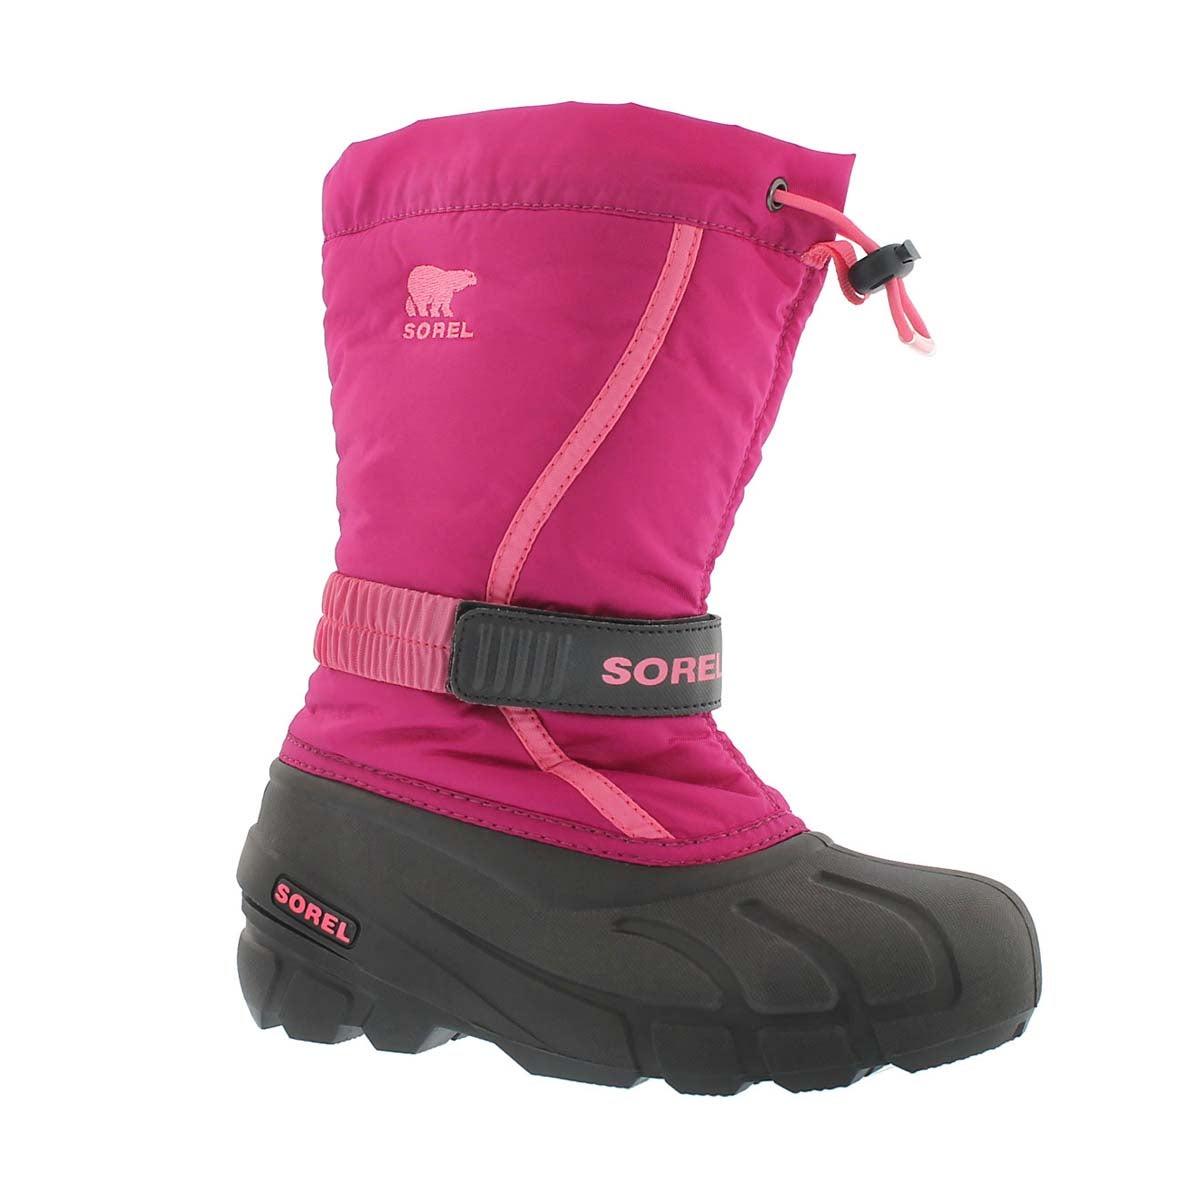 Grls Flurry blush/pnk pullon winter boot